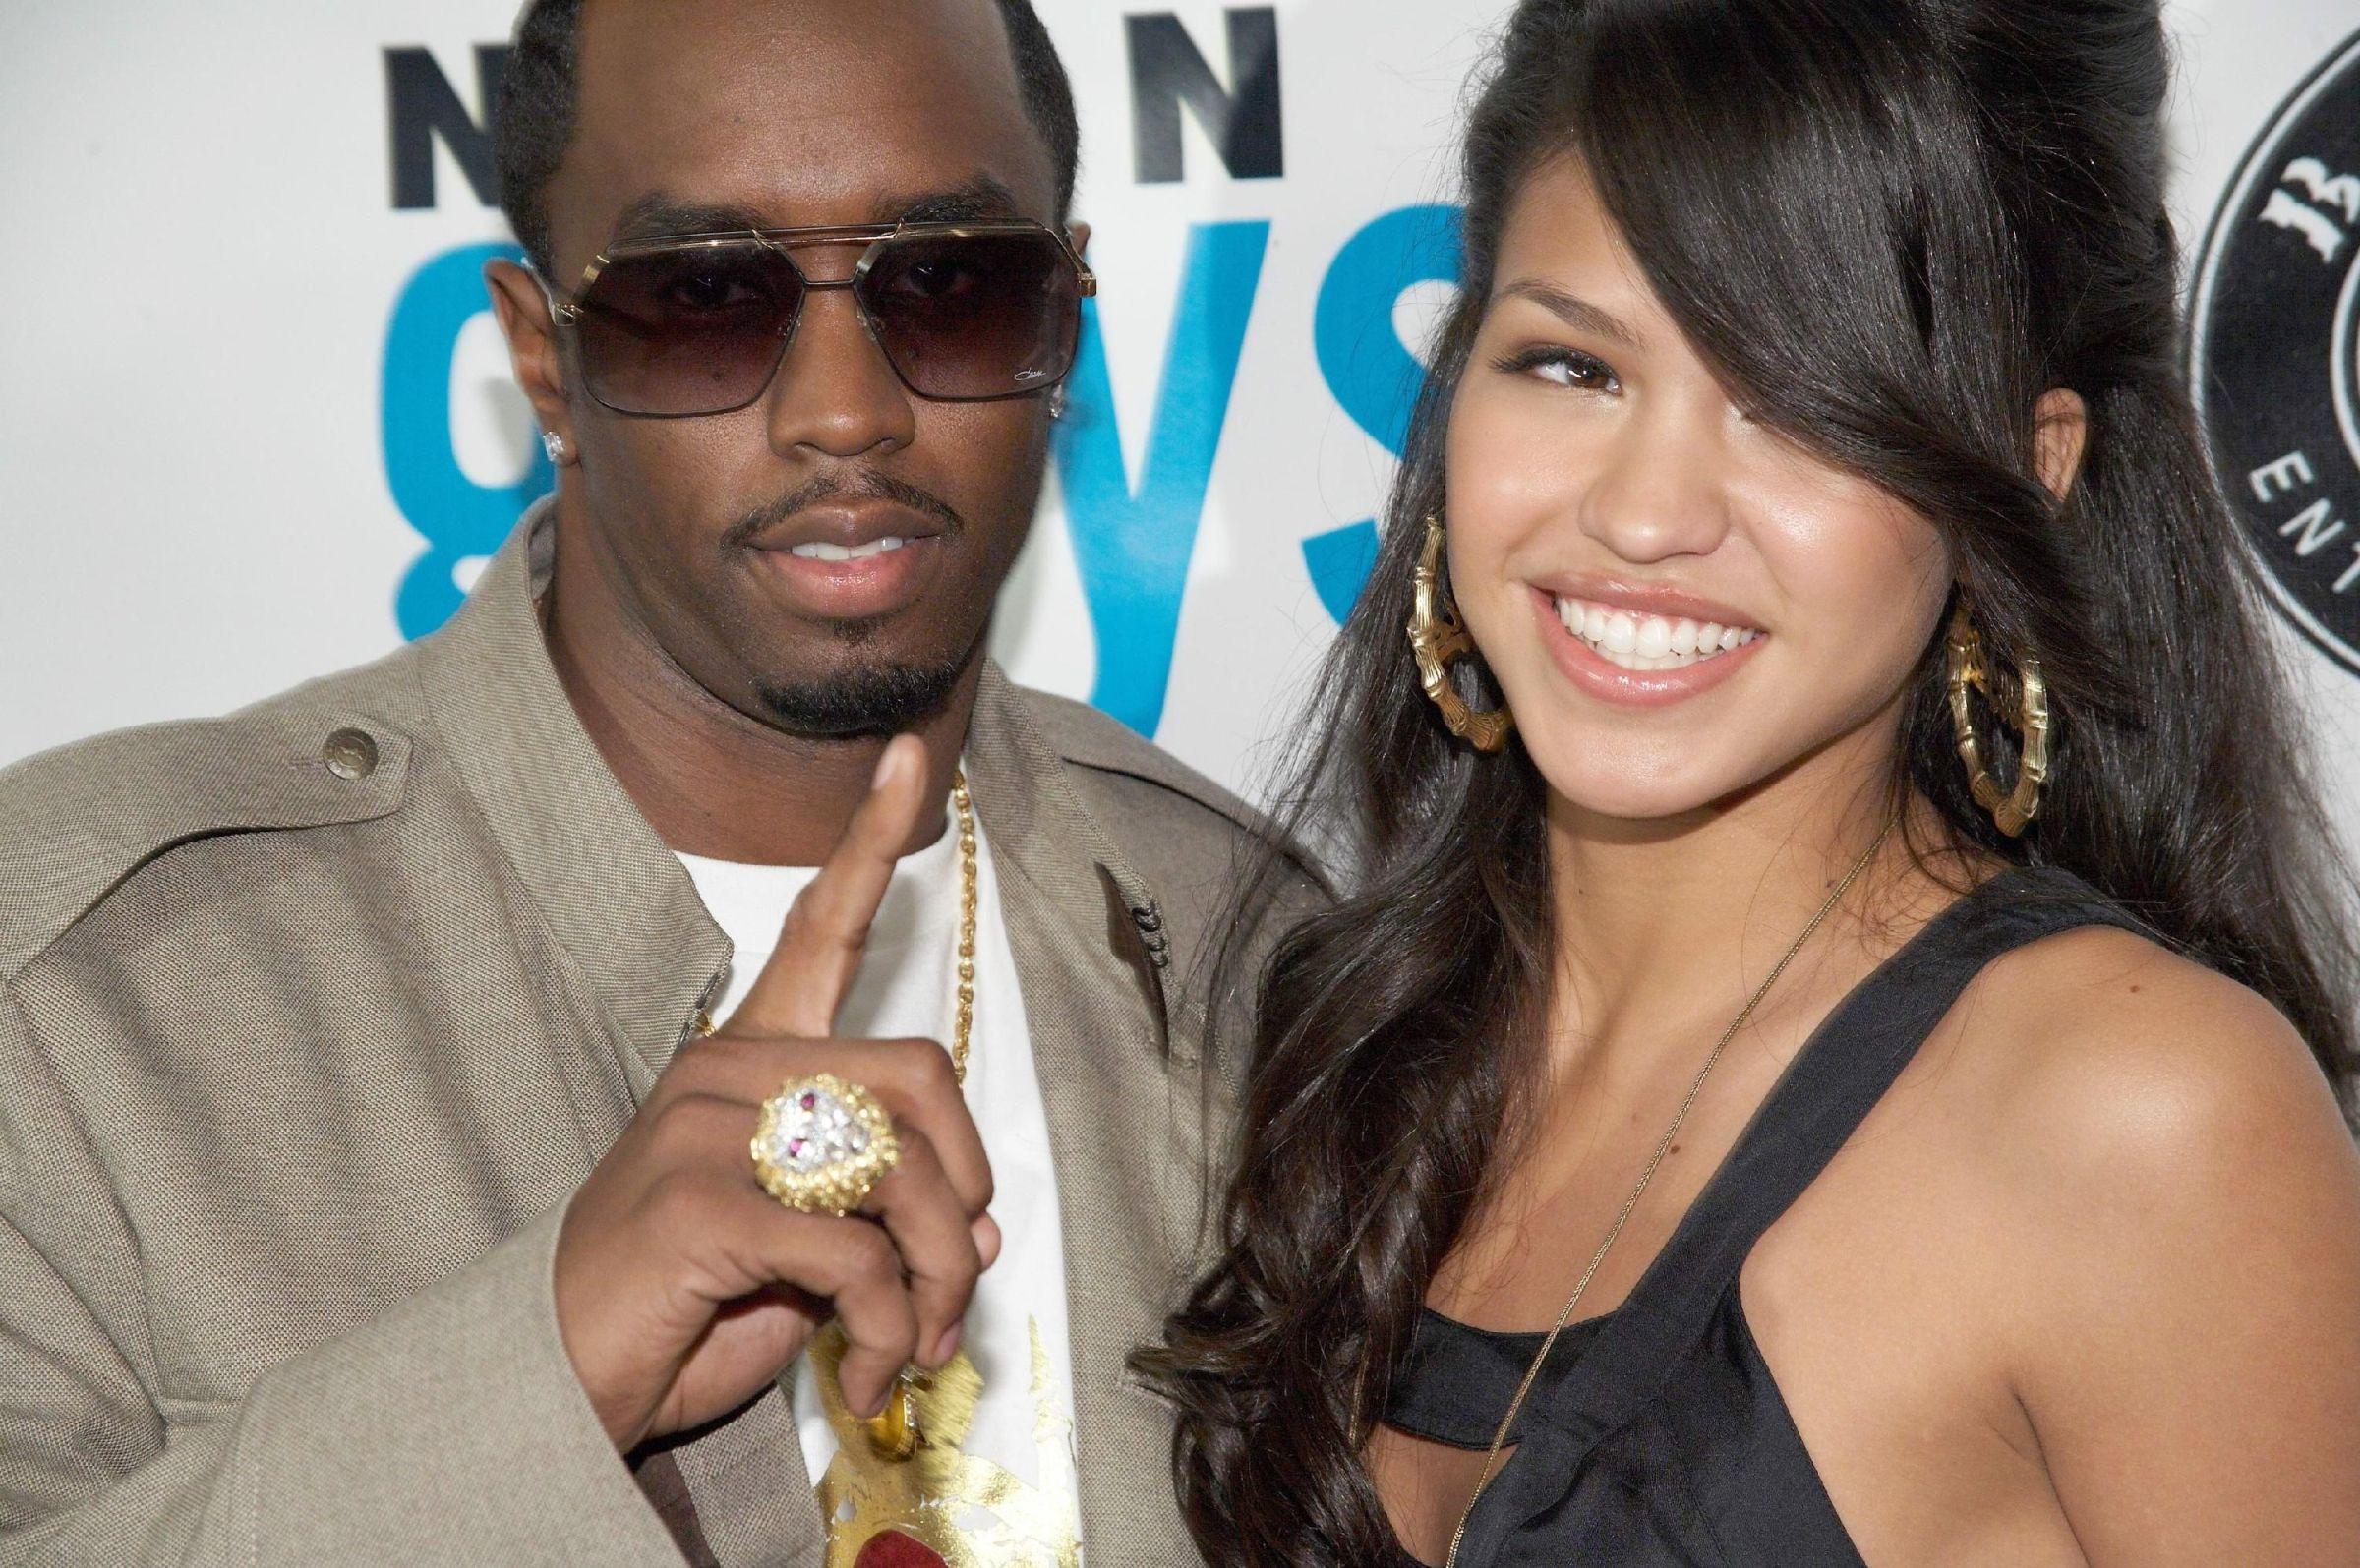 Sean Diddy Combs Not Engaged to Cassie Ventura Despite